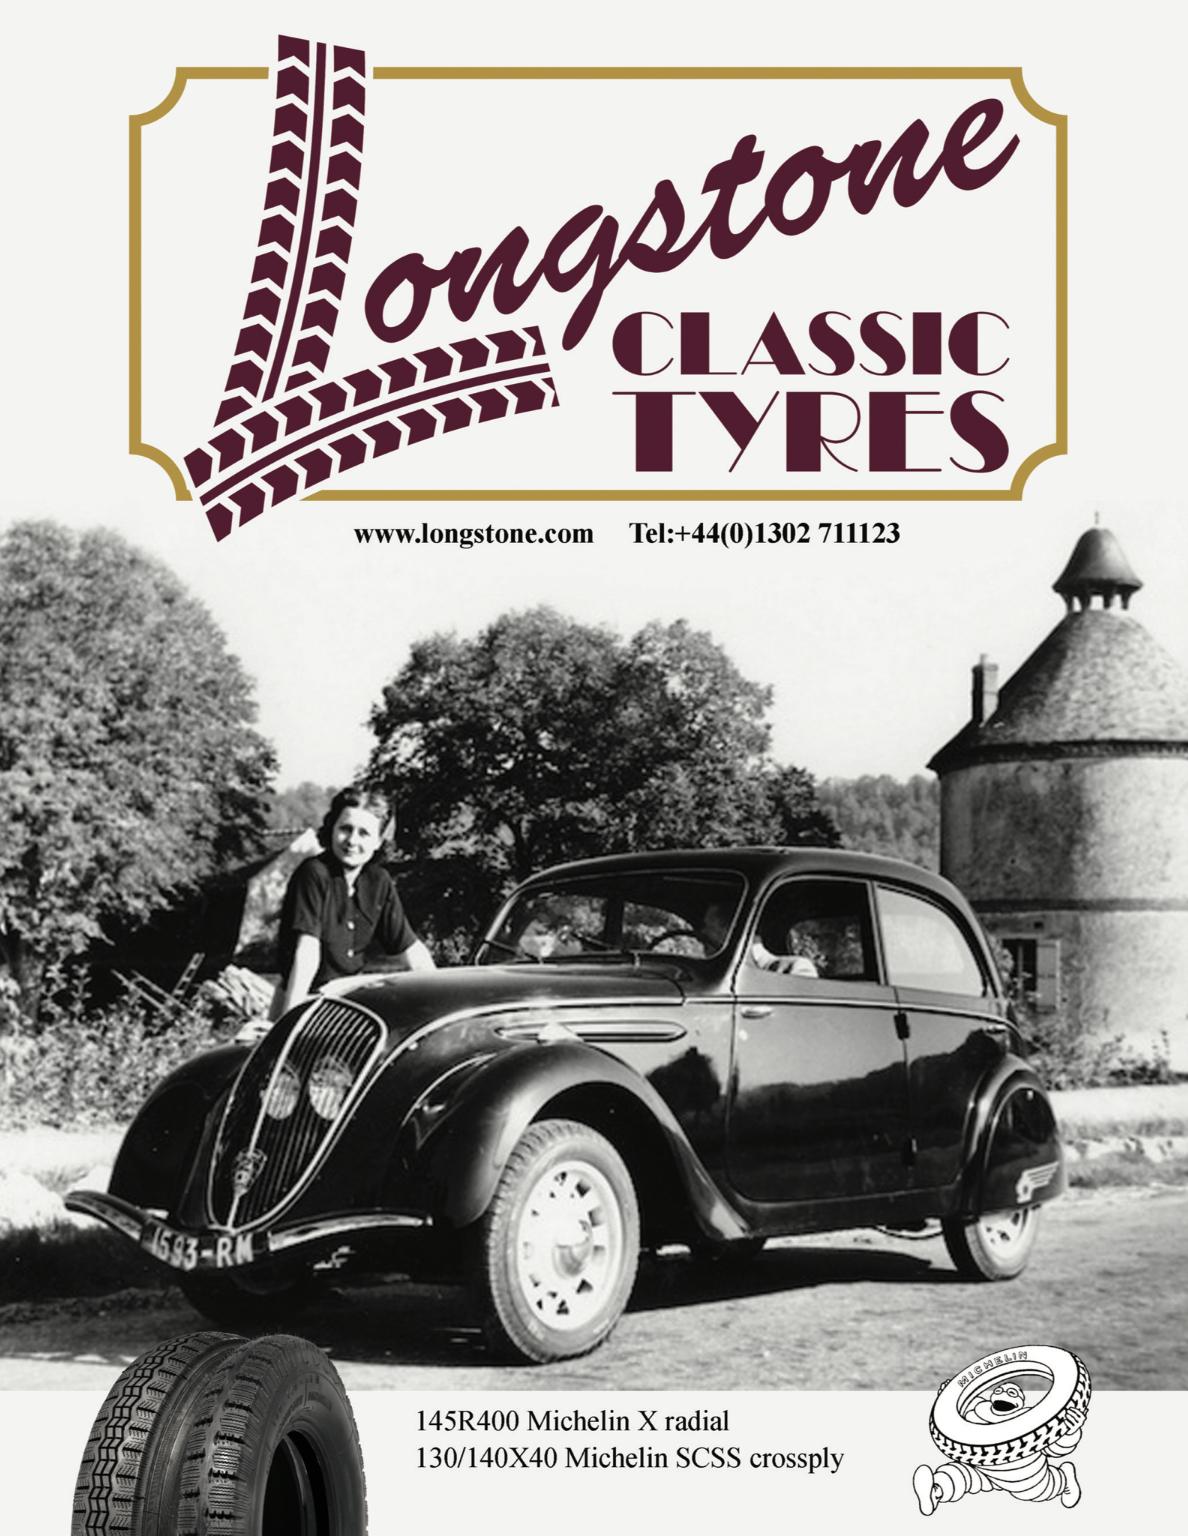 Longstone Classic Tyres - Tyres, tires,